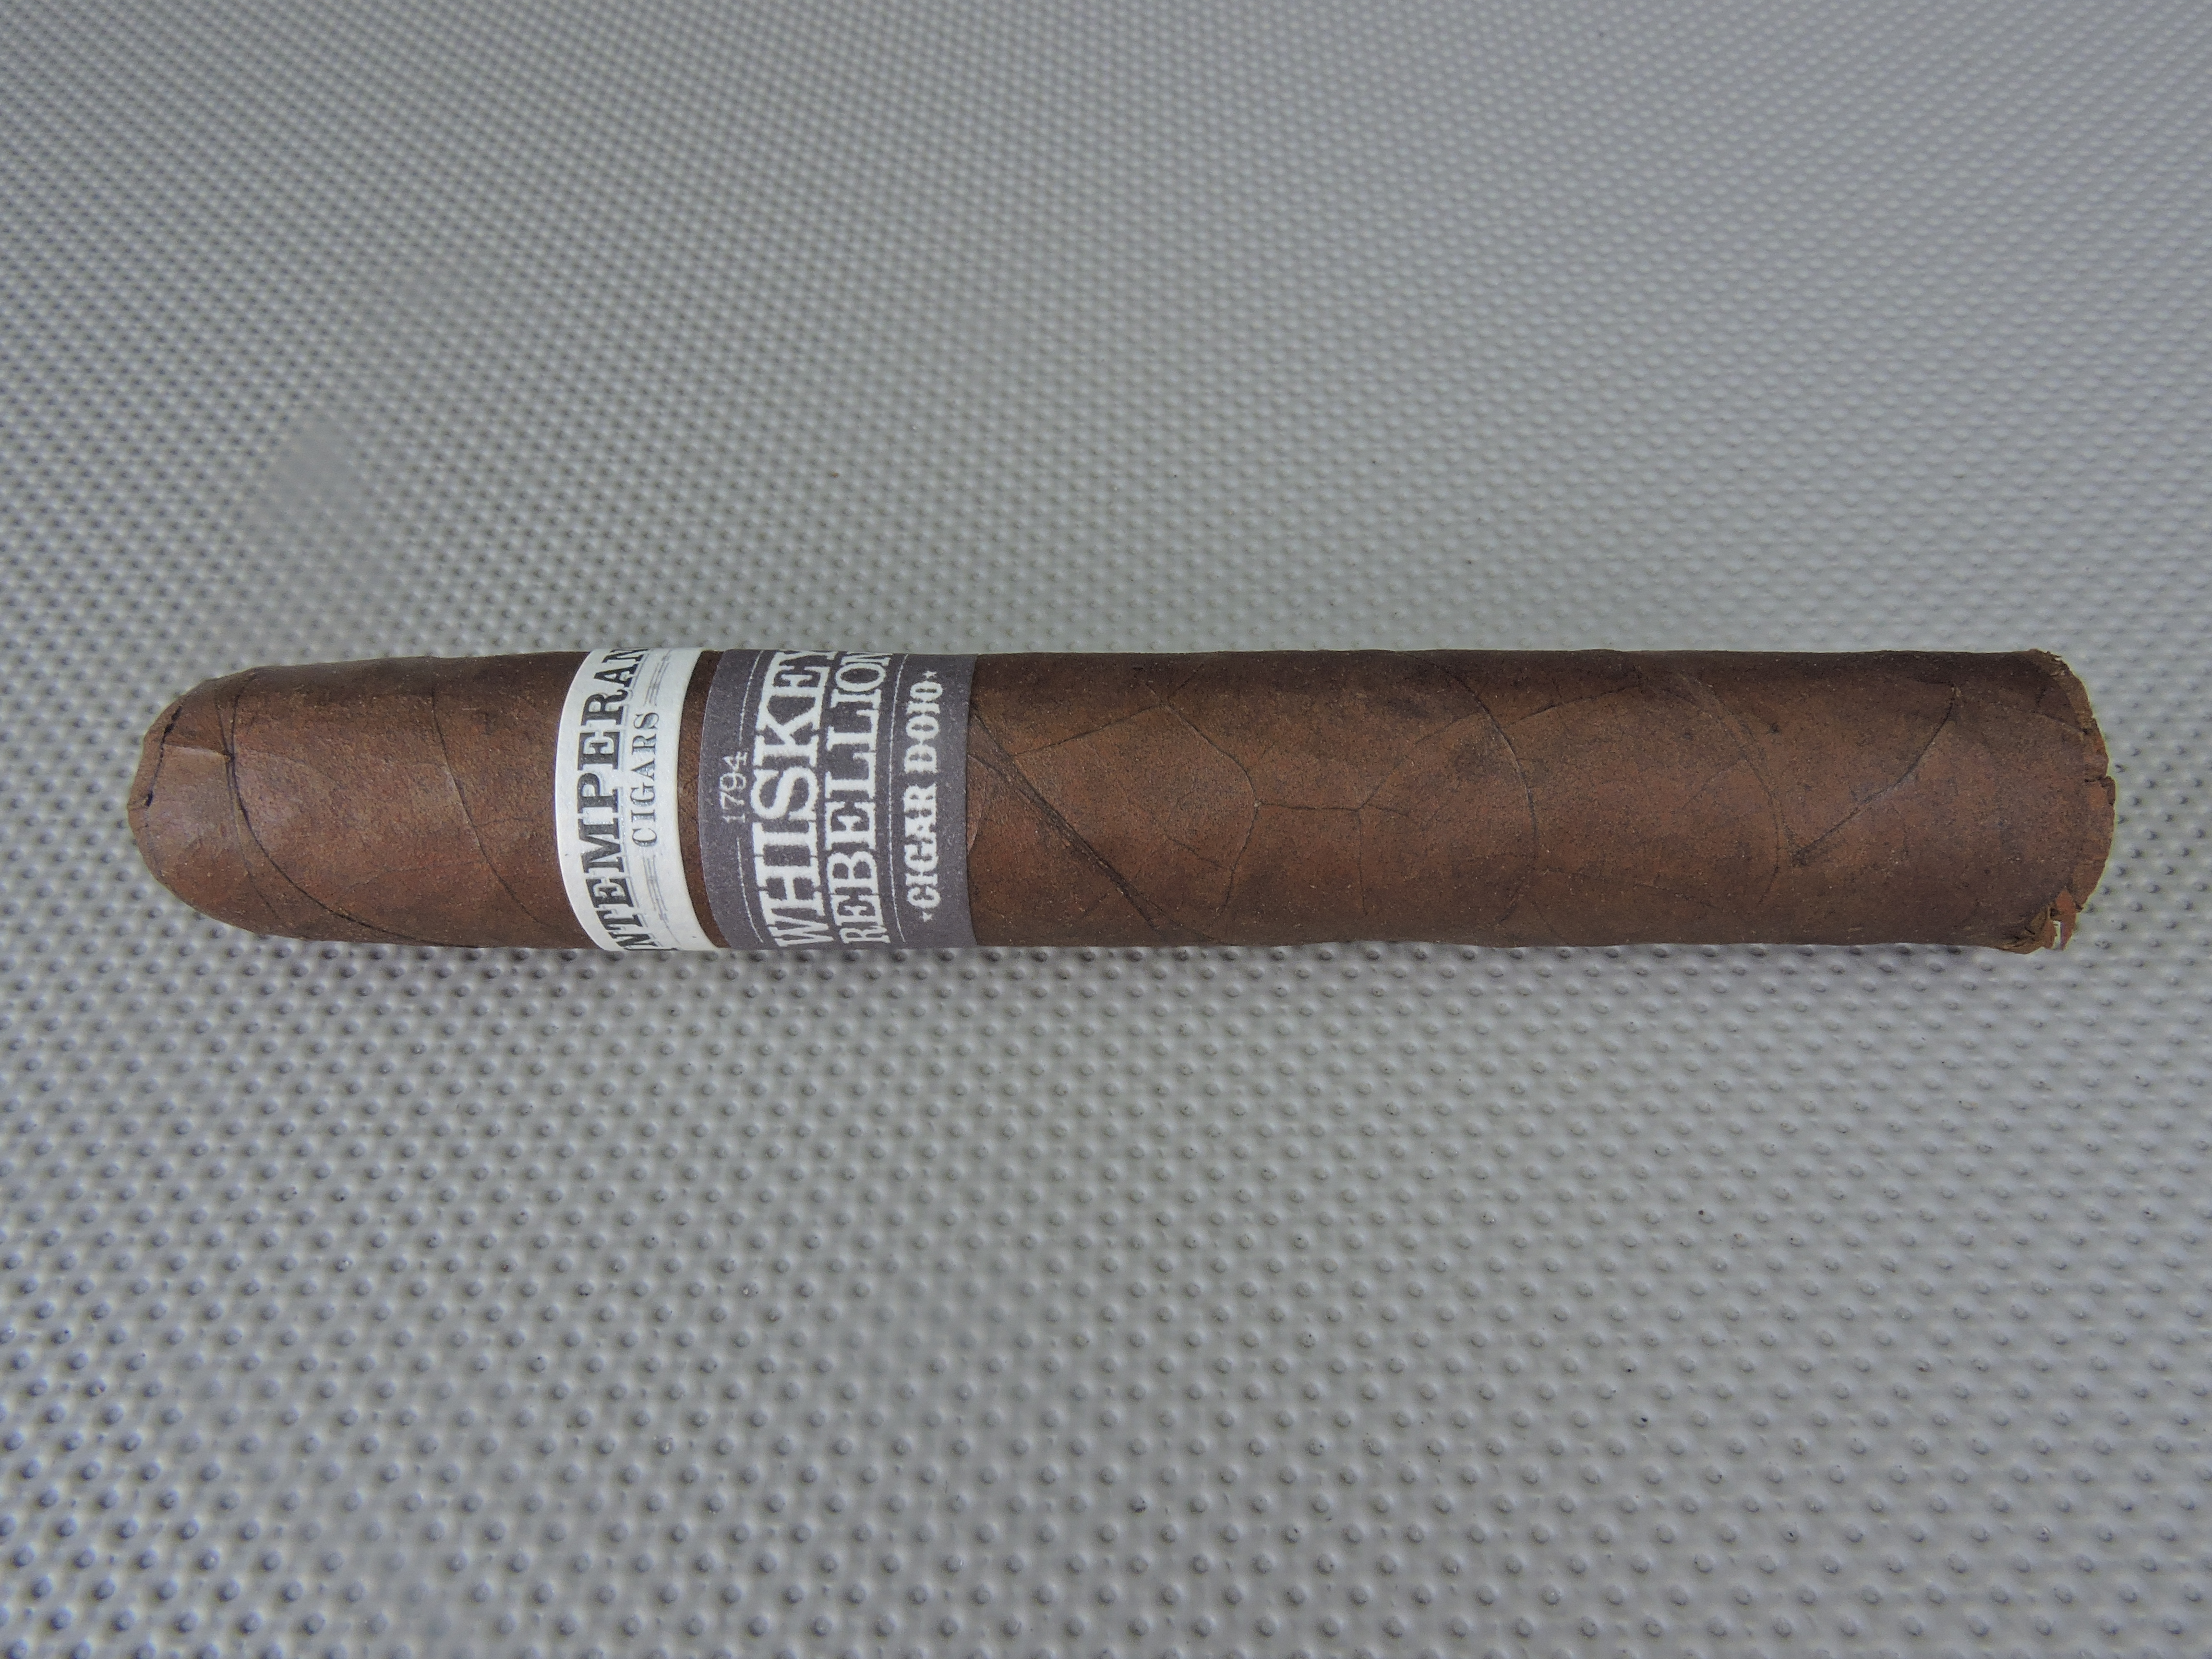 Cigar Review: RoMa Craft Tobac Intemperance Whiskey Rebellion 1794-Cigar Dojo Edition